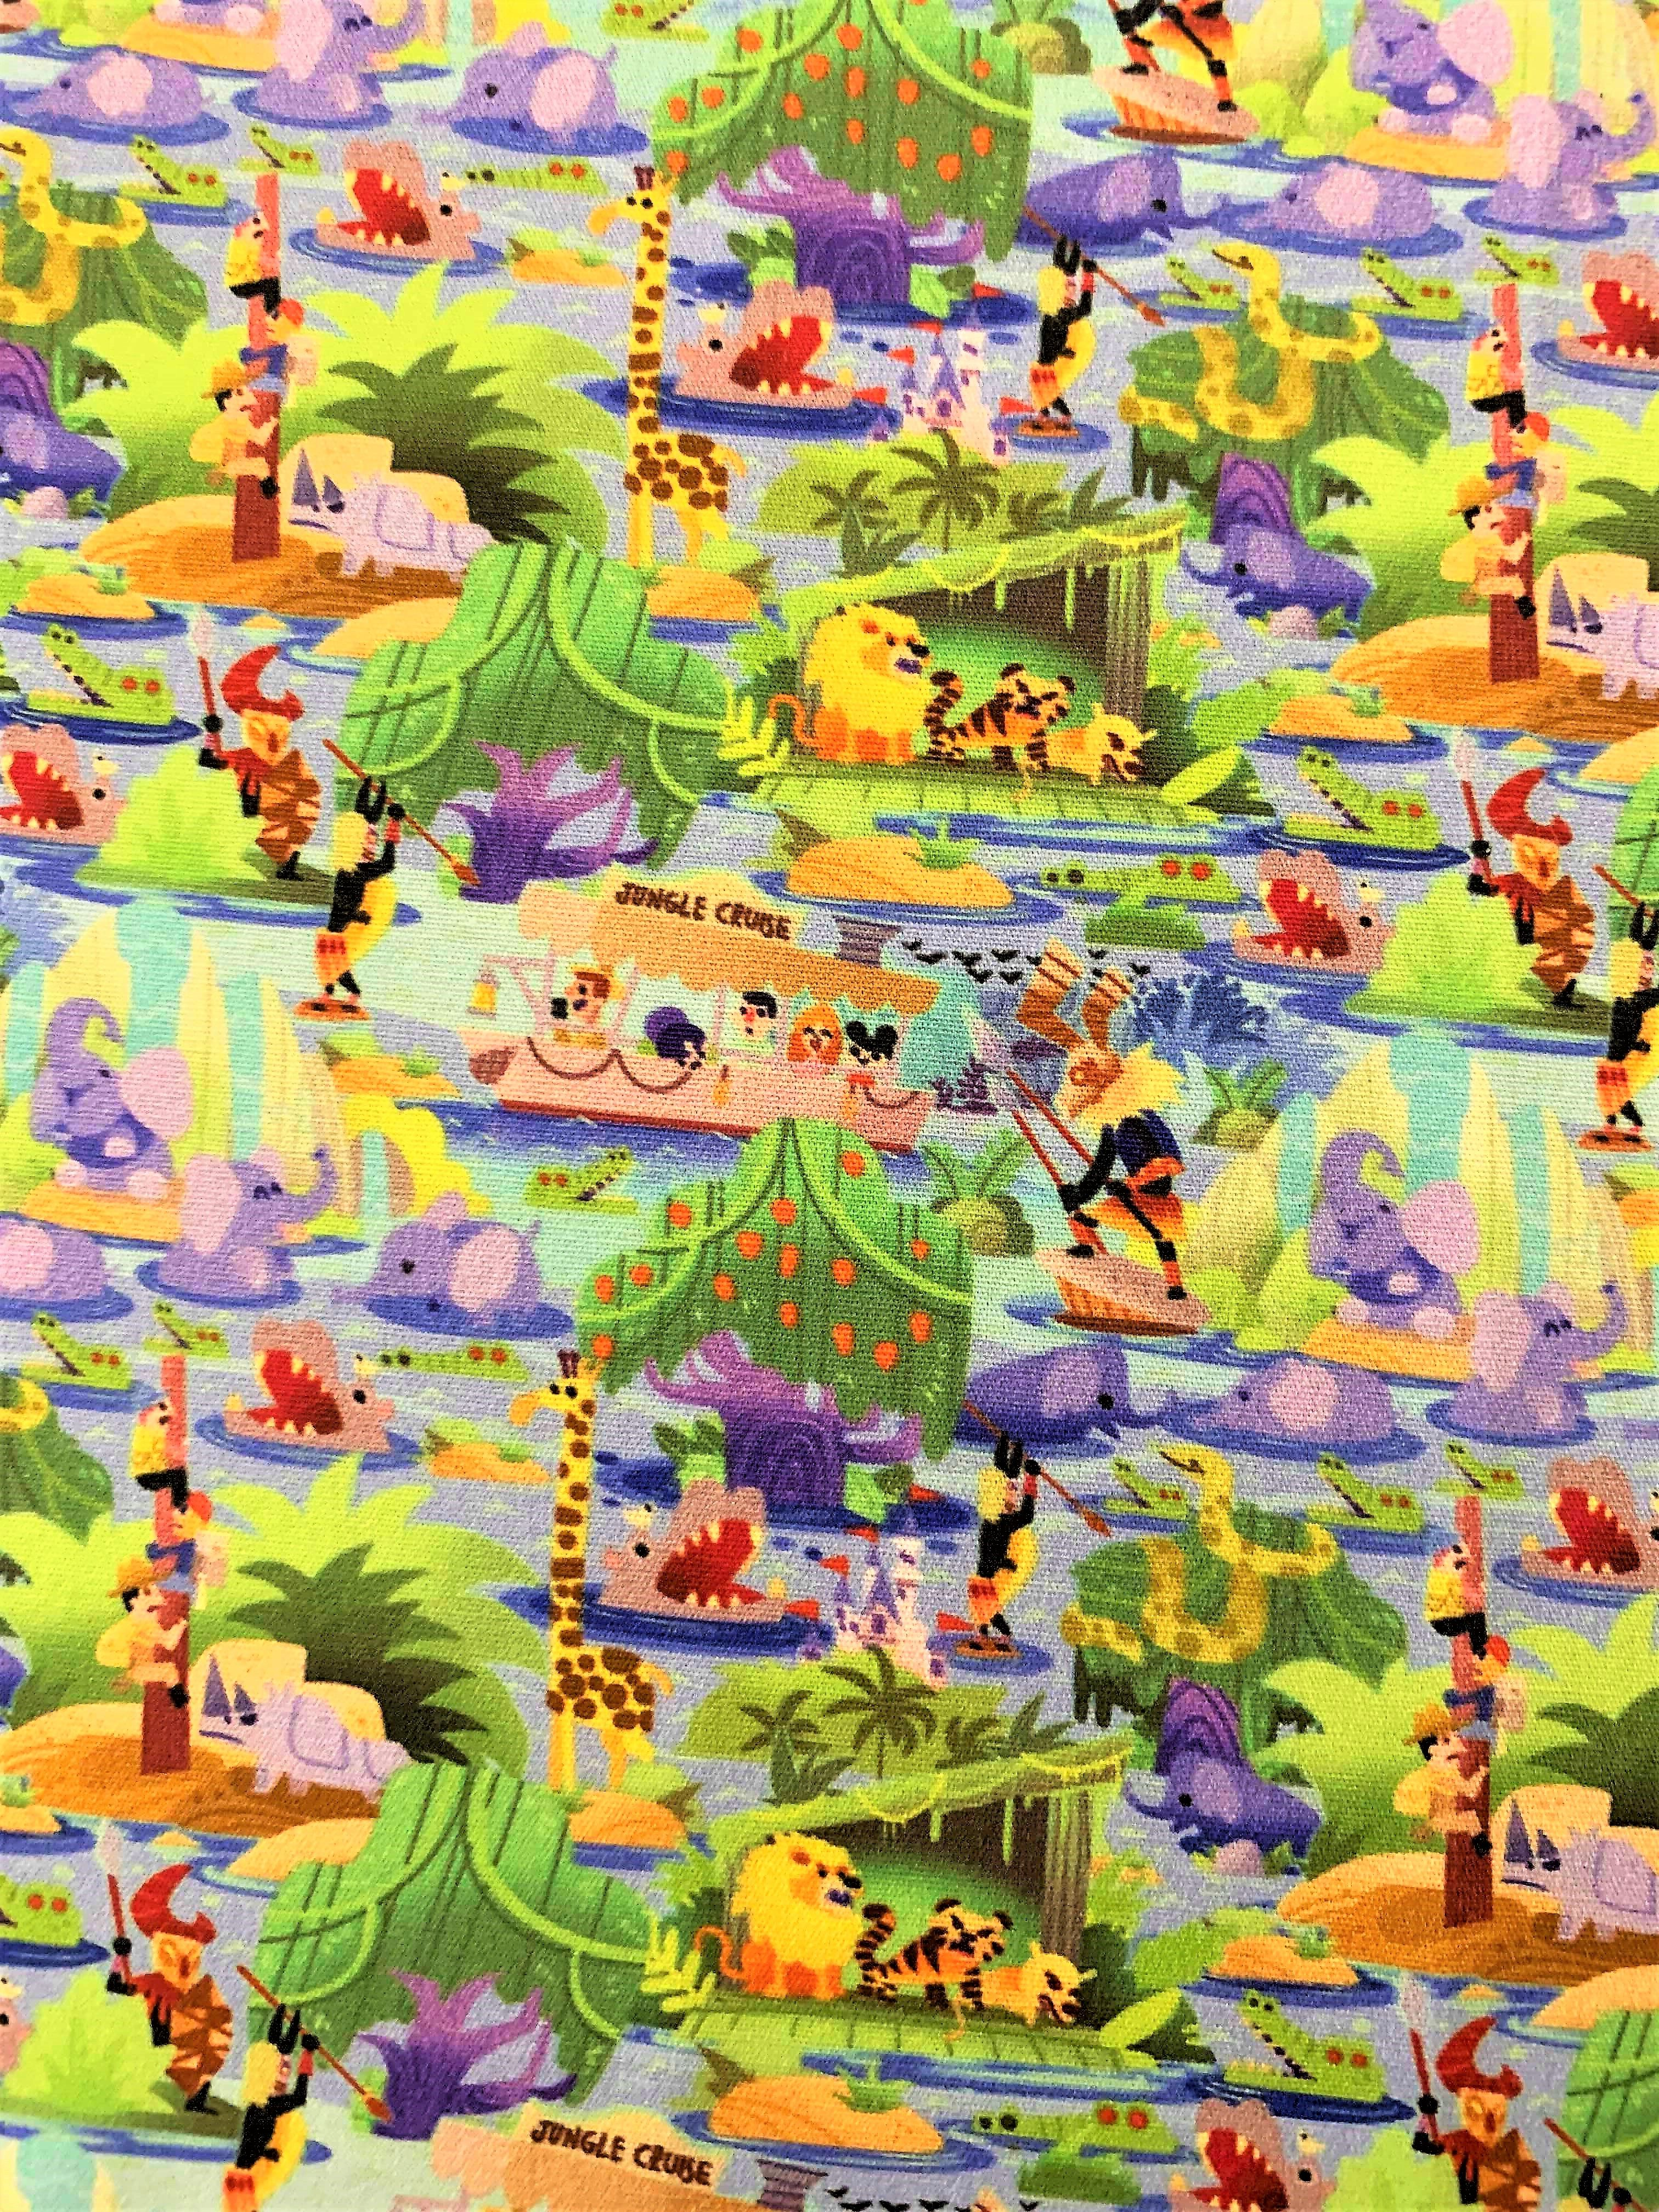 Jungle Cruise Disney Wallpaper Disney Fabric Disneyland Art Wallpaper Digital Wallpaper Disney Wallpaper